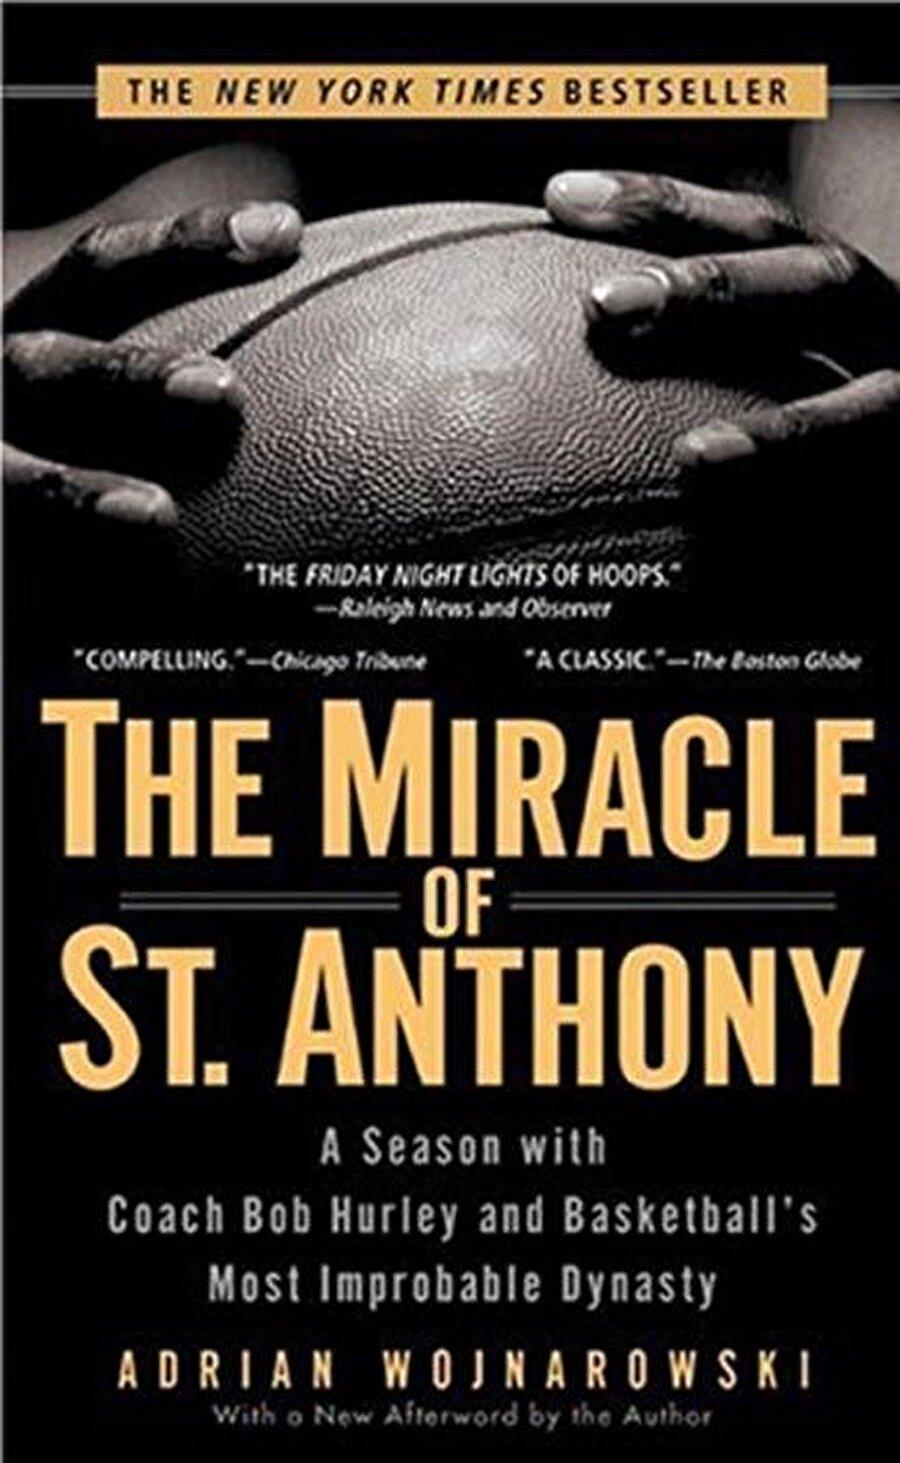 THE MIRACLE OF ST. ANTHONY: Adrian Wojnarowski